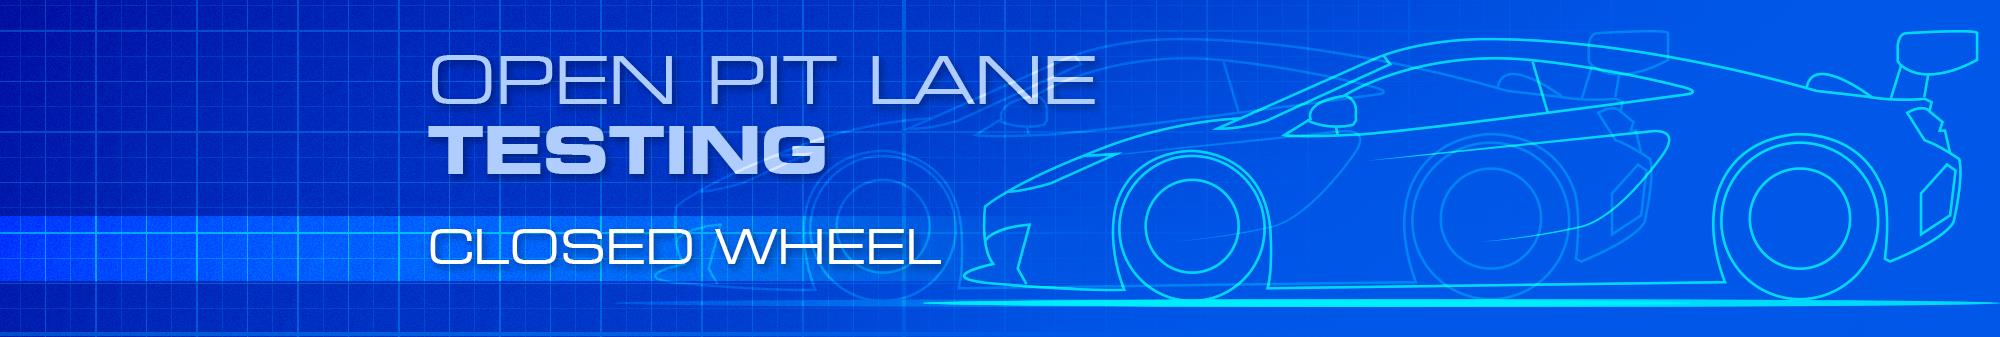 Open Pit Lane Testing - £150